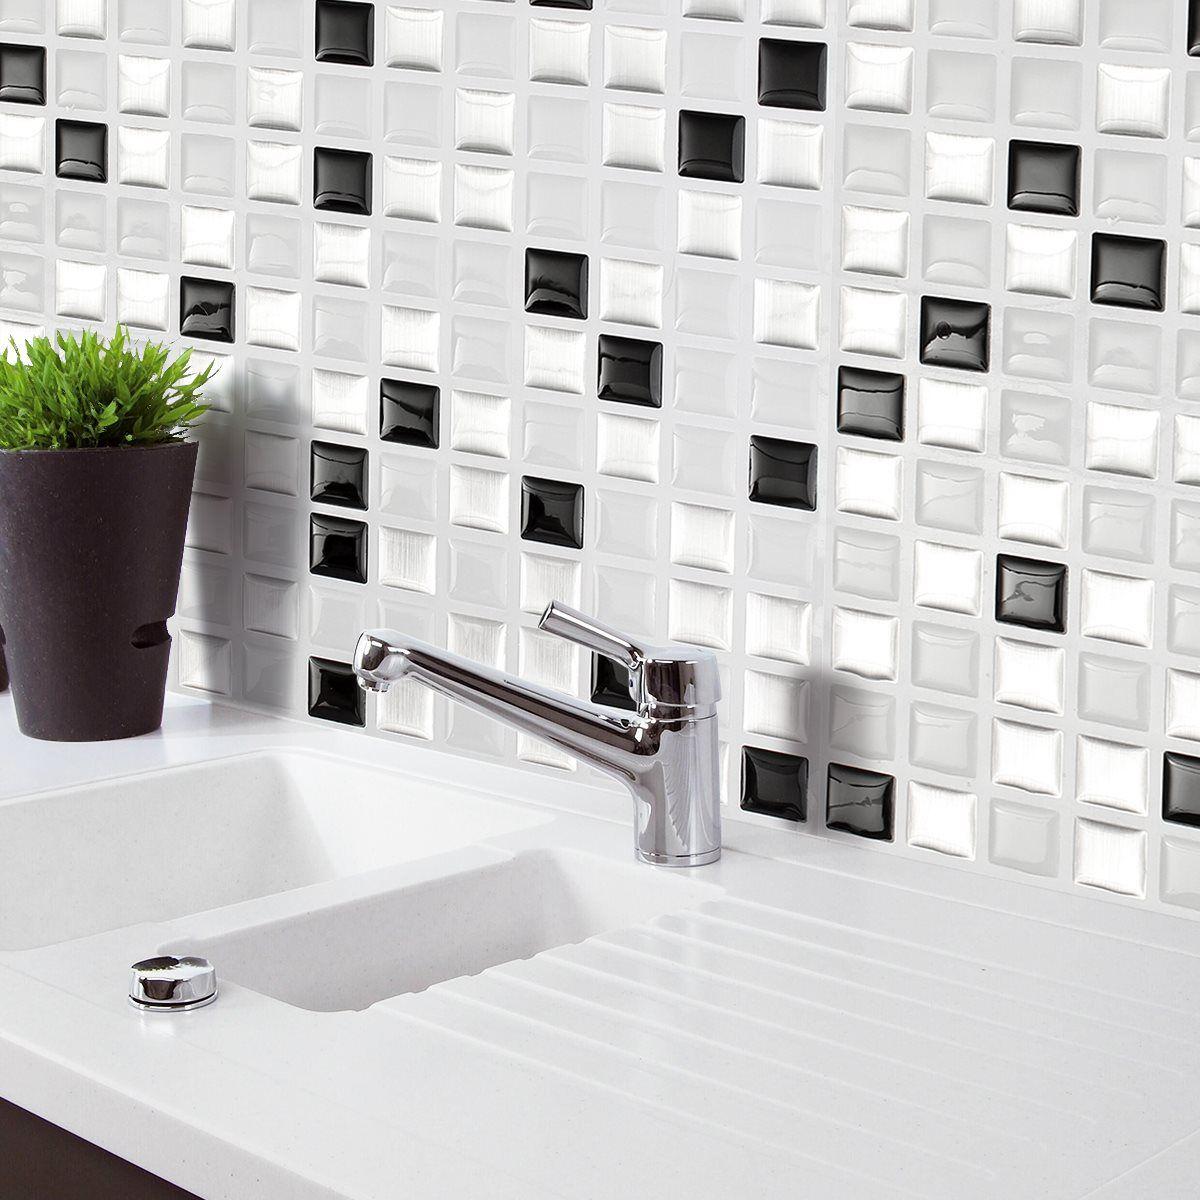 Grosshandel Wohnkultur Ziegel Mosaik Kuche Badezimmerfolie Schonheit